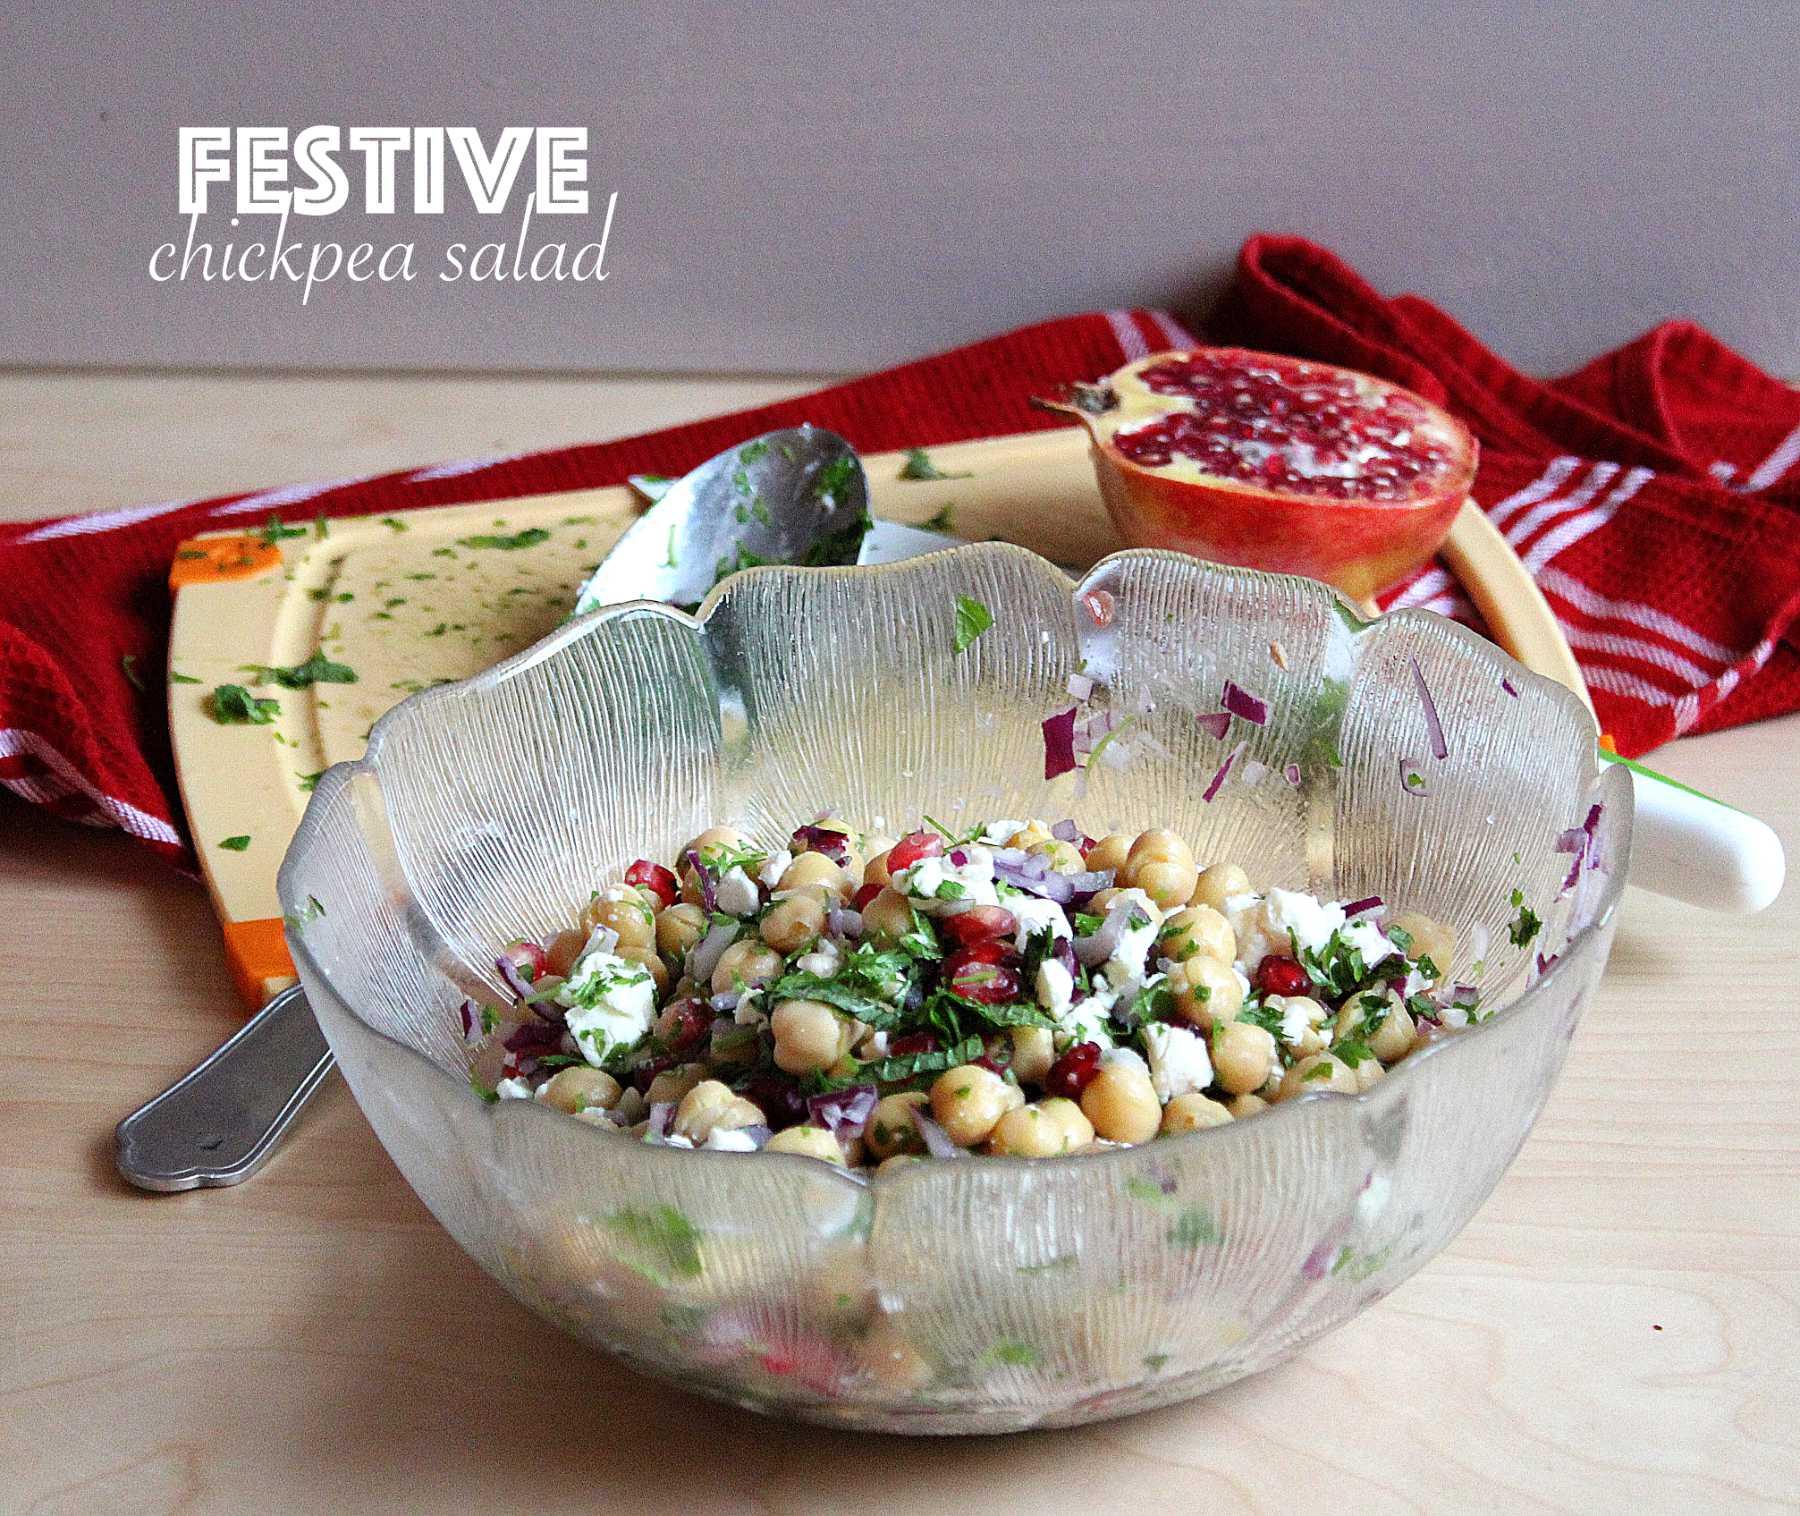 Salade de pois chiche festive